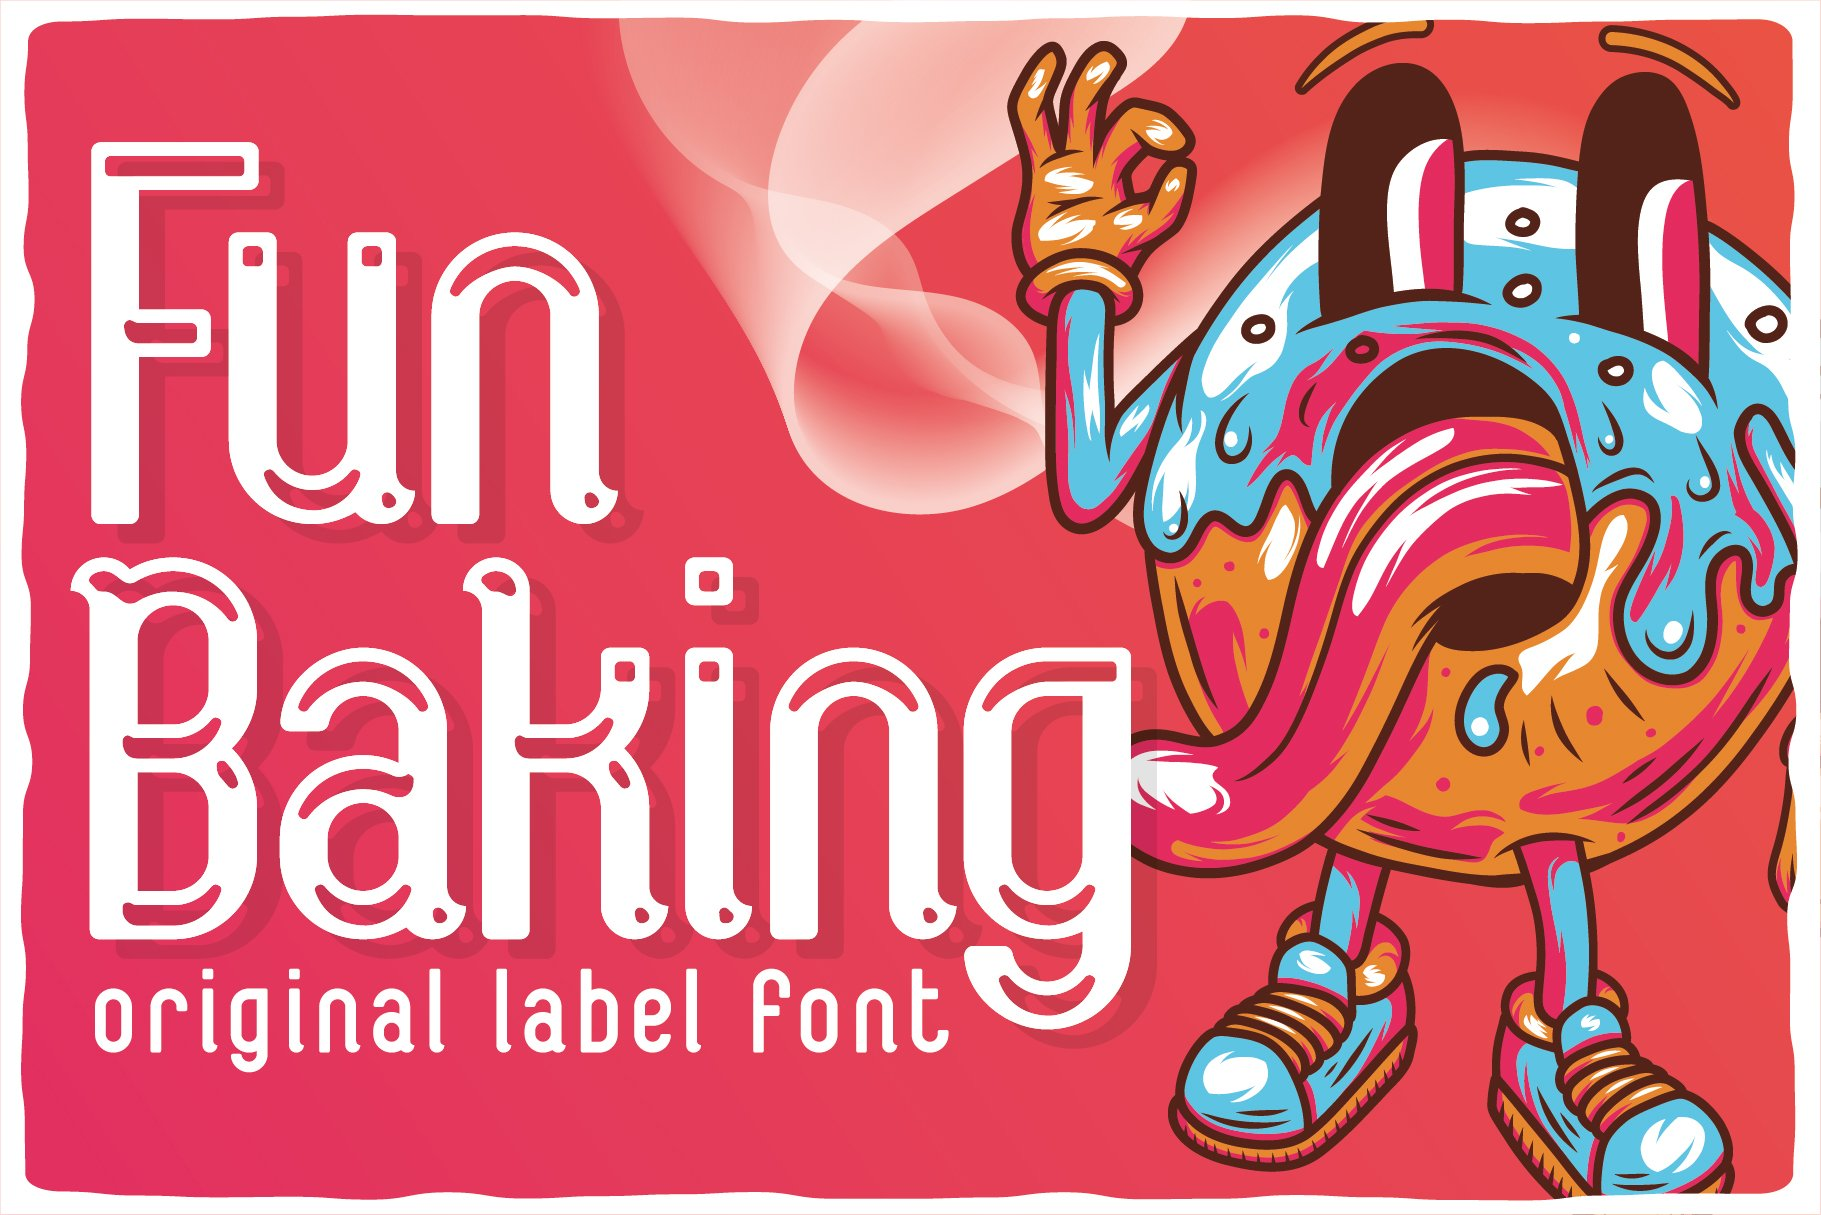 Funbaking original label font.